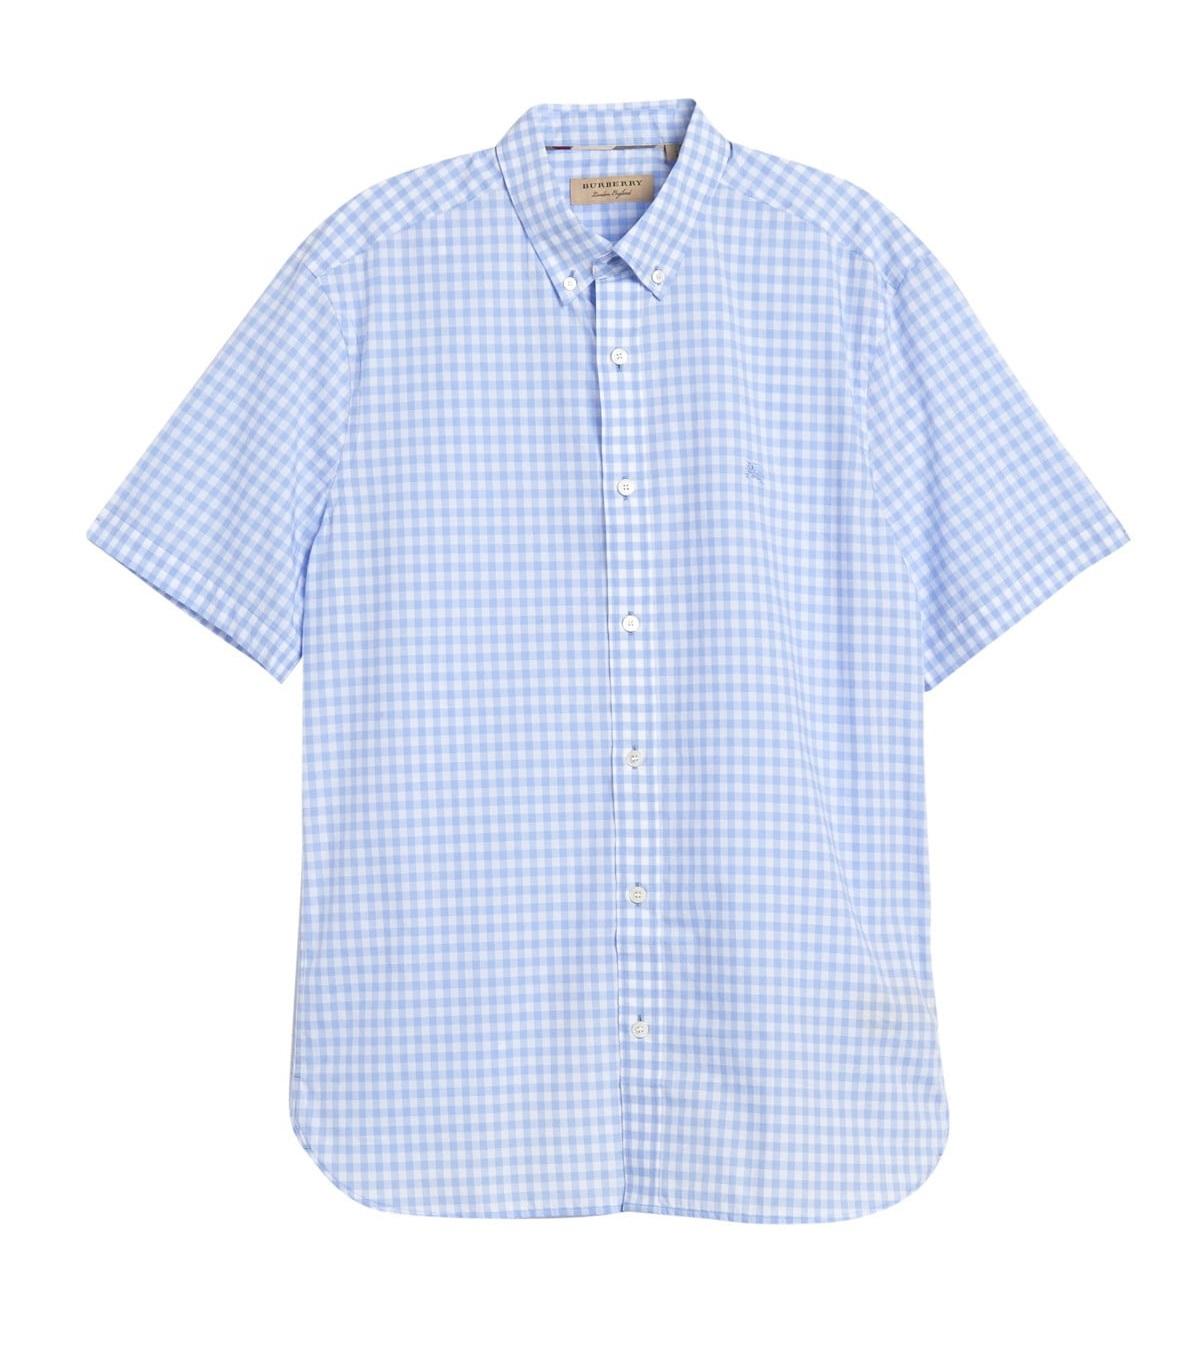 Burberry Stopford Plaid Slim Fit Shirt In Pale Blue